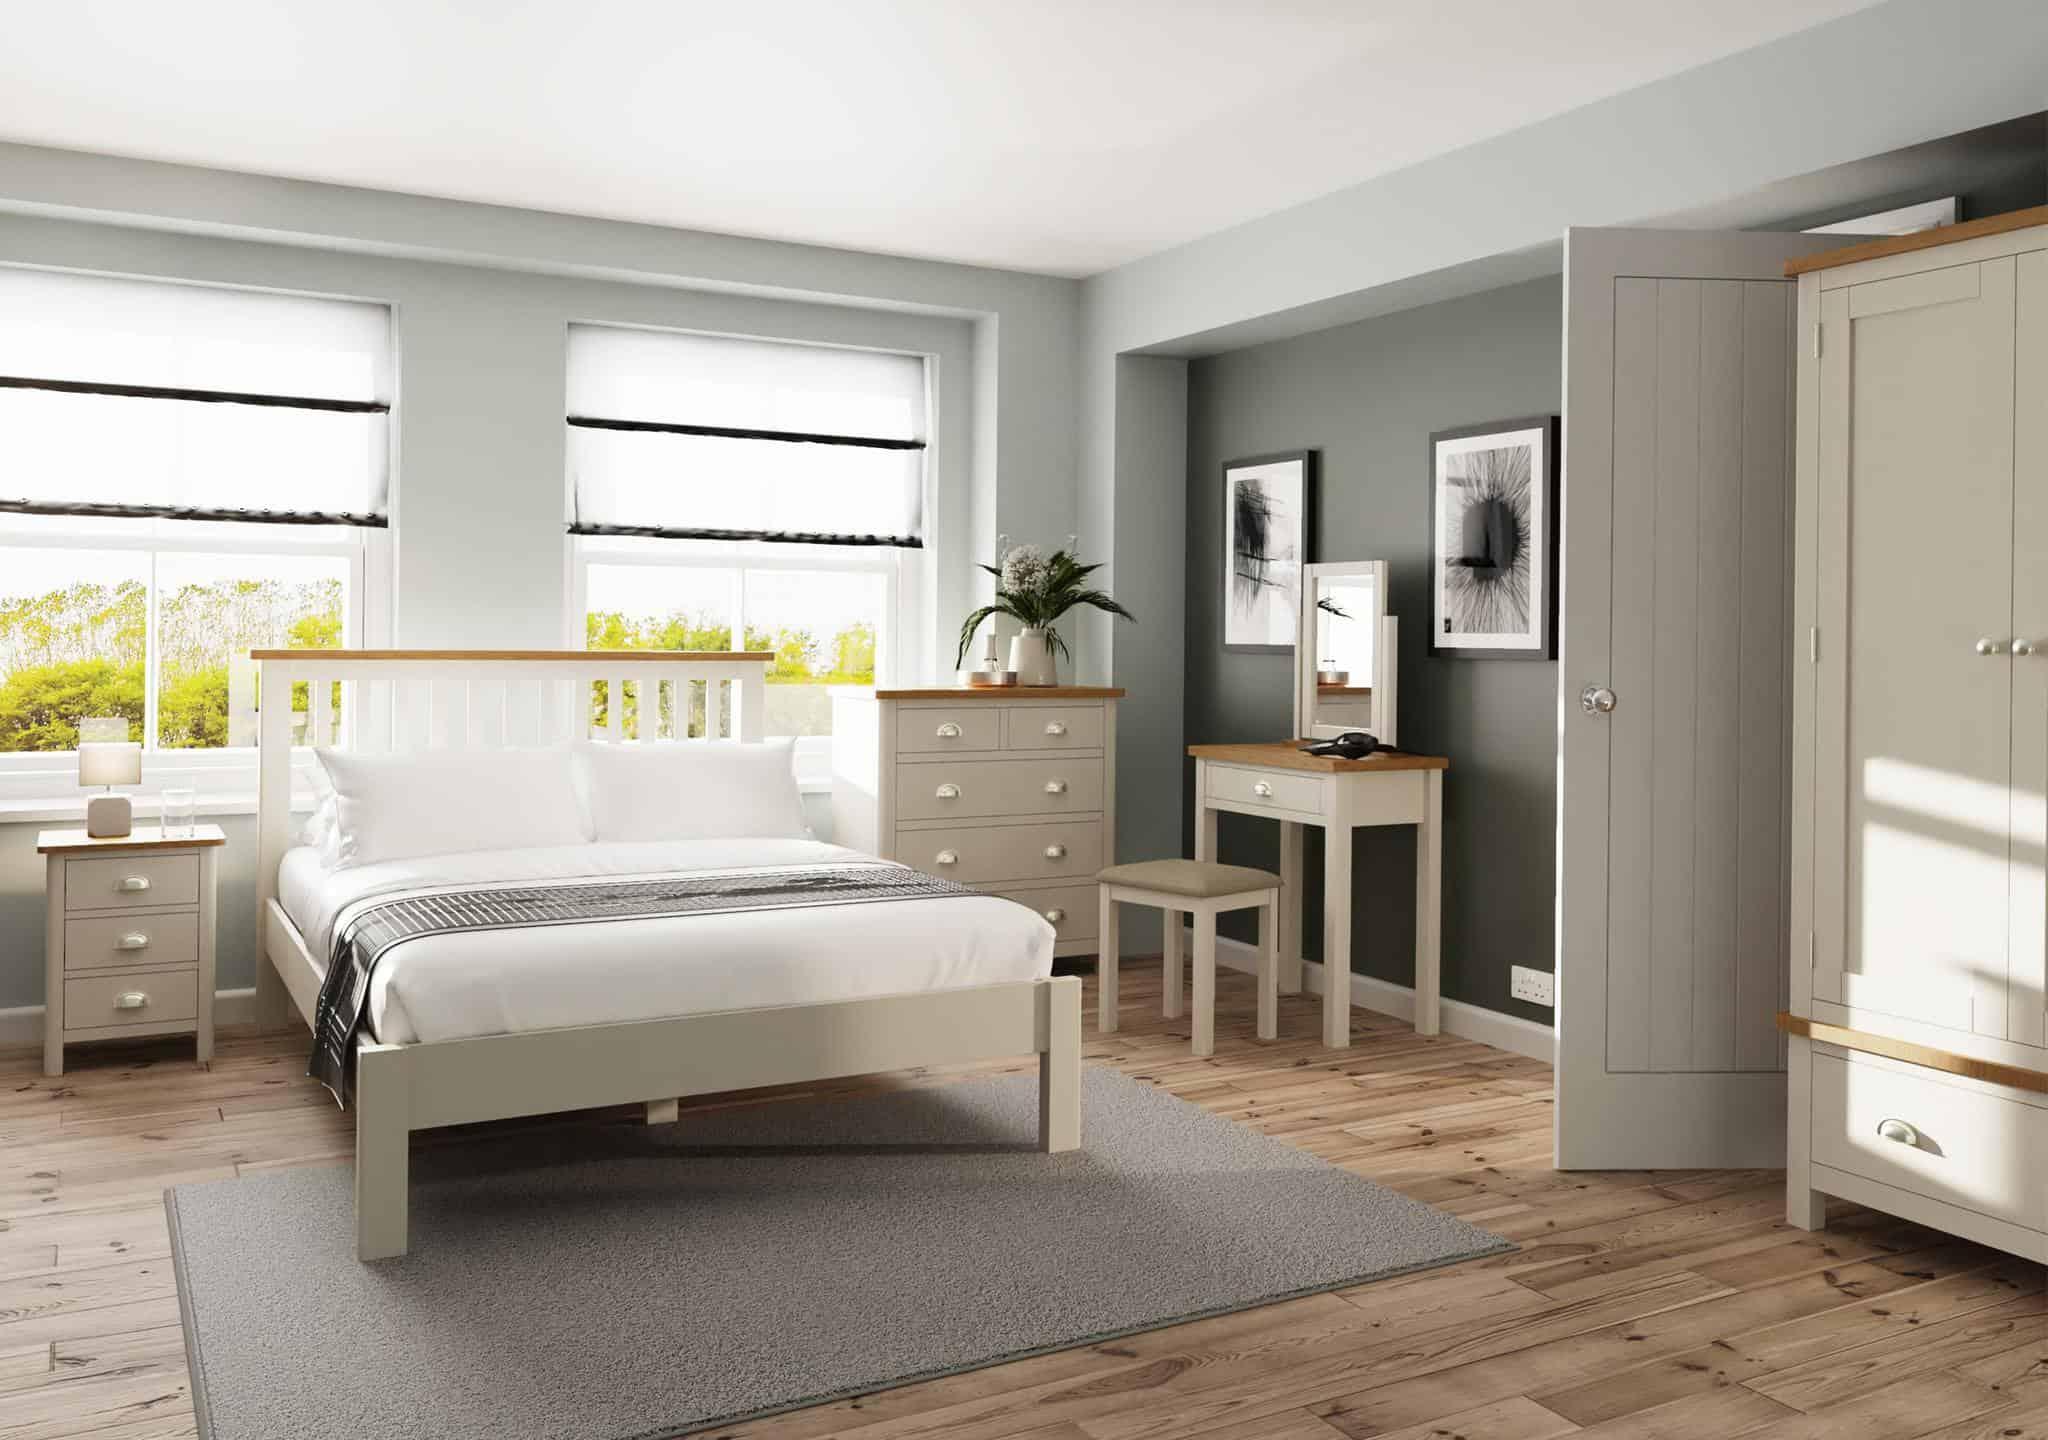 ra bedroom roomset v2